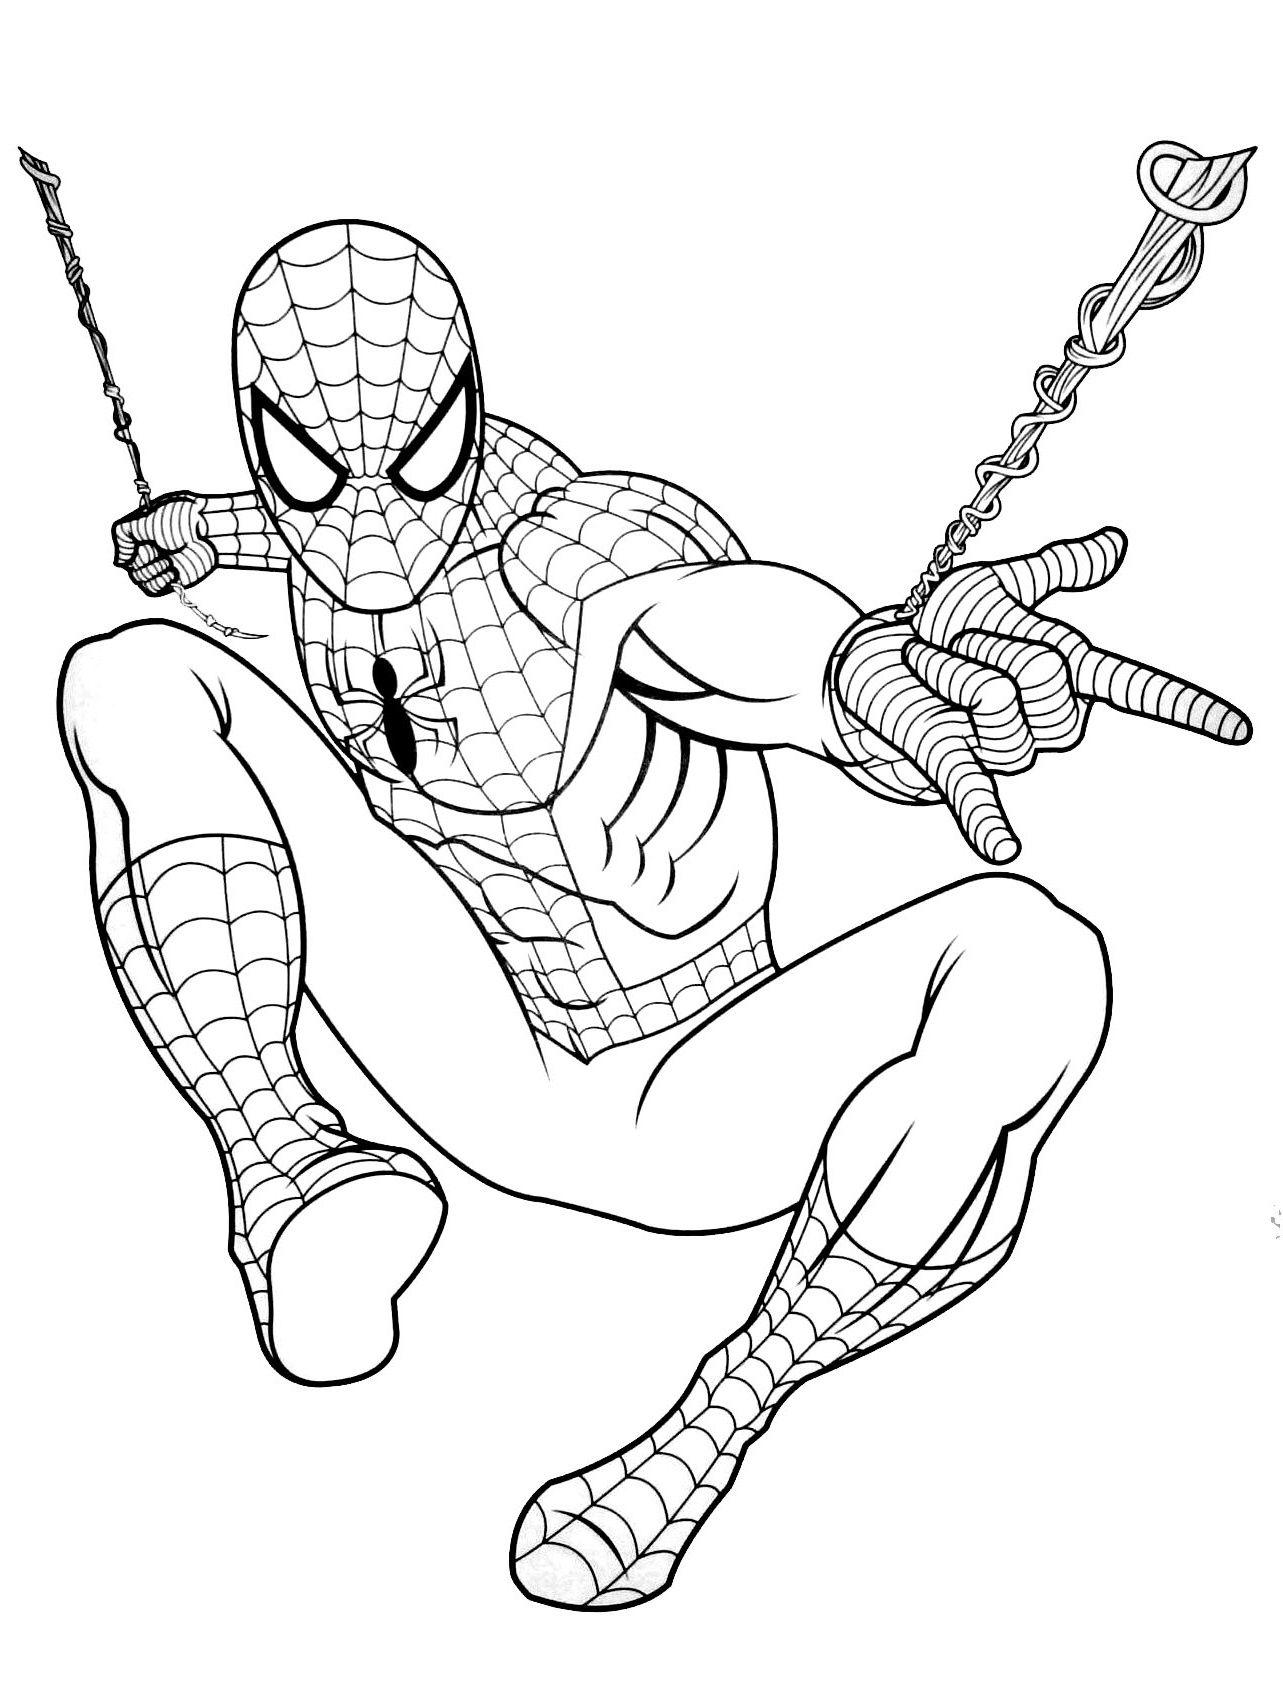 8 Inspirant De Spiderman Coloriage A Imprimer Galerie Buku Mewarnai Warna Buku